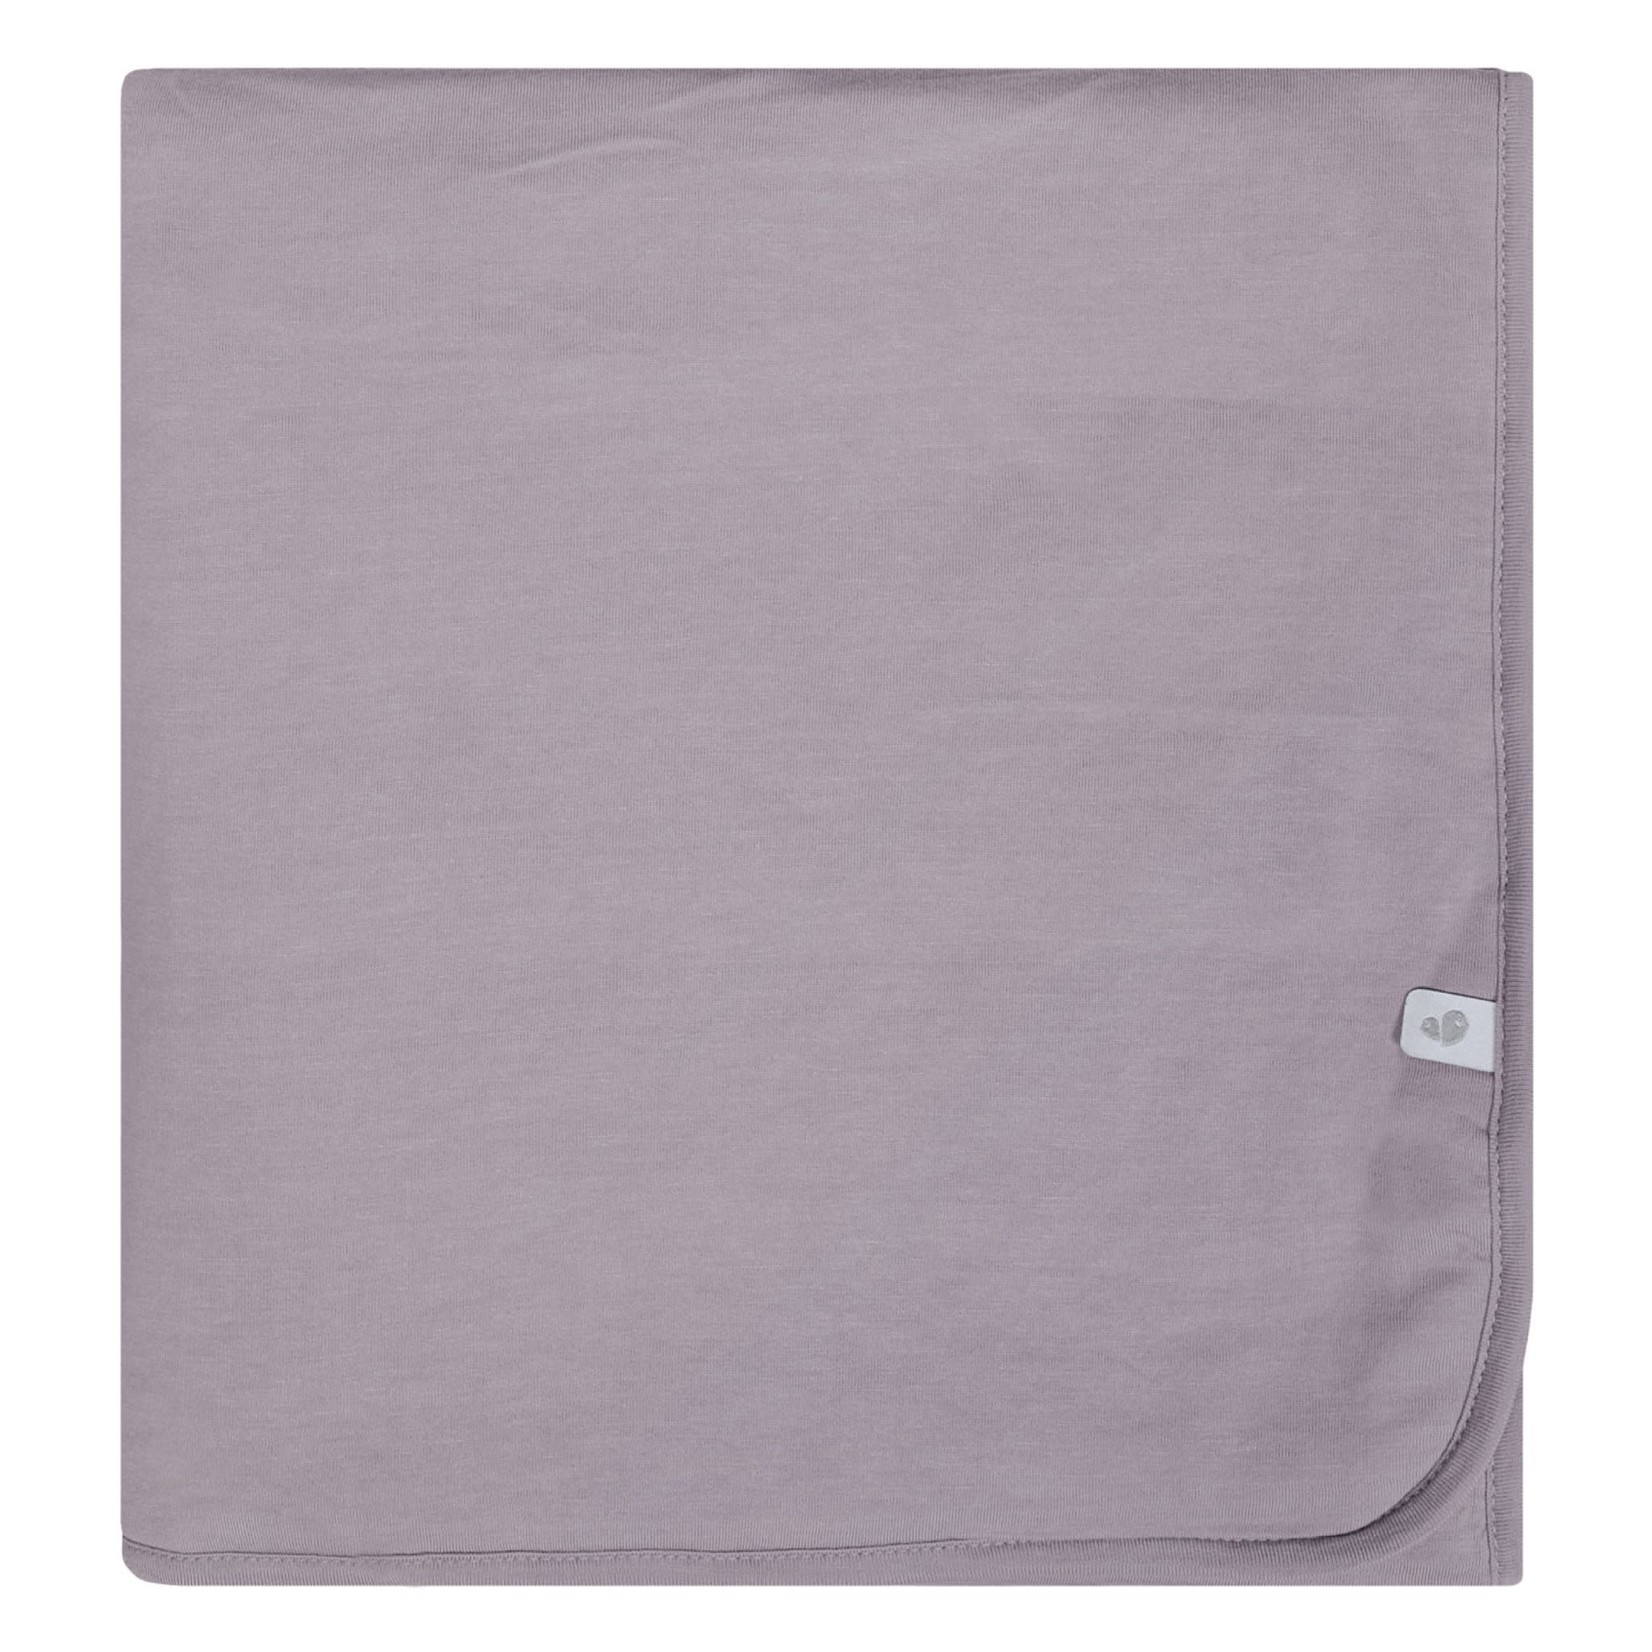 Bamboo Blanket - Plum